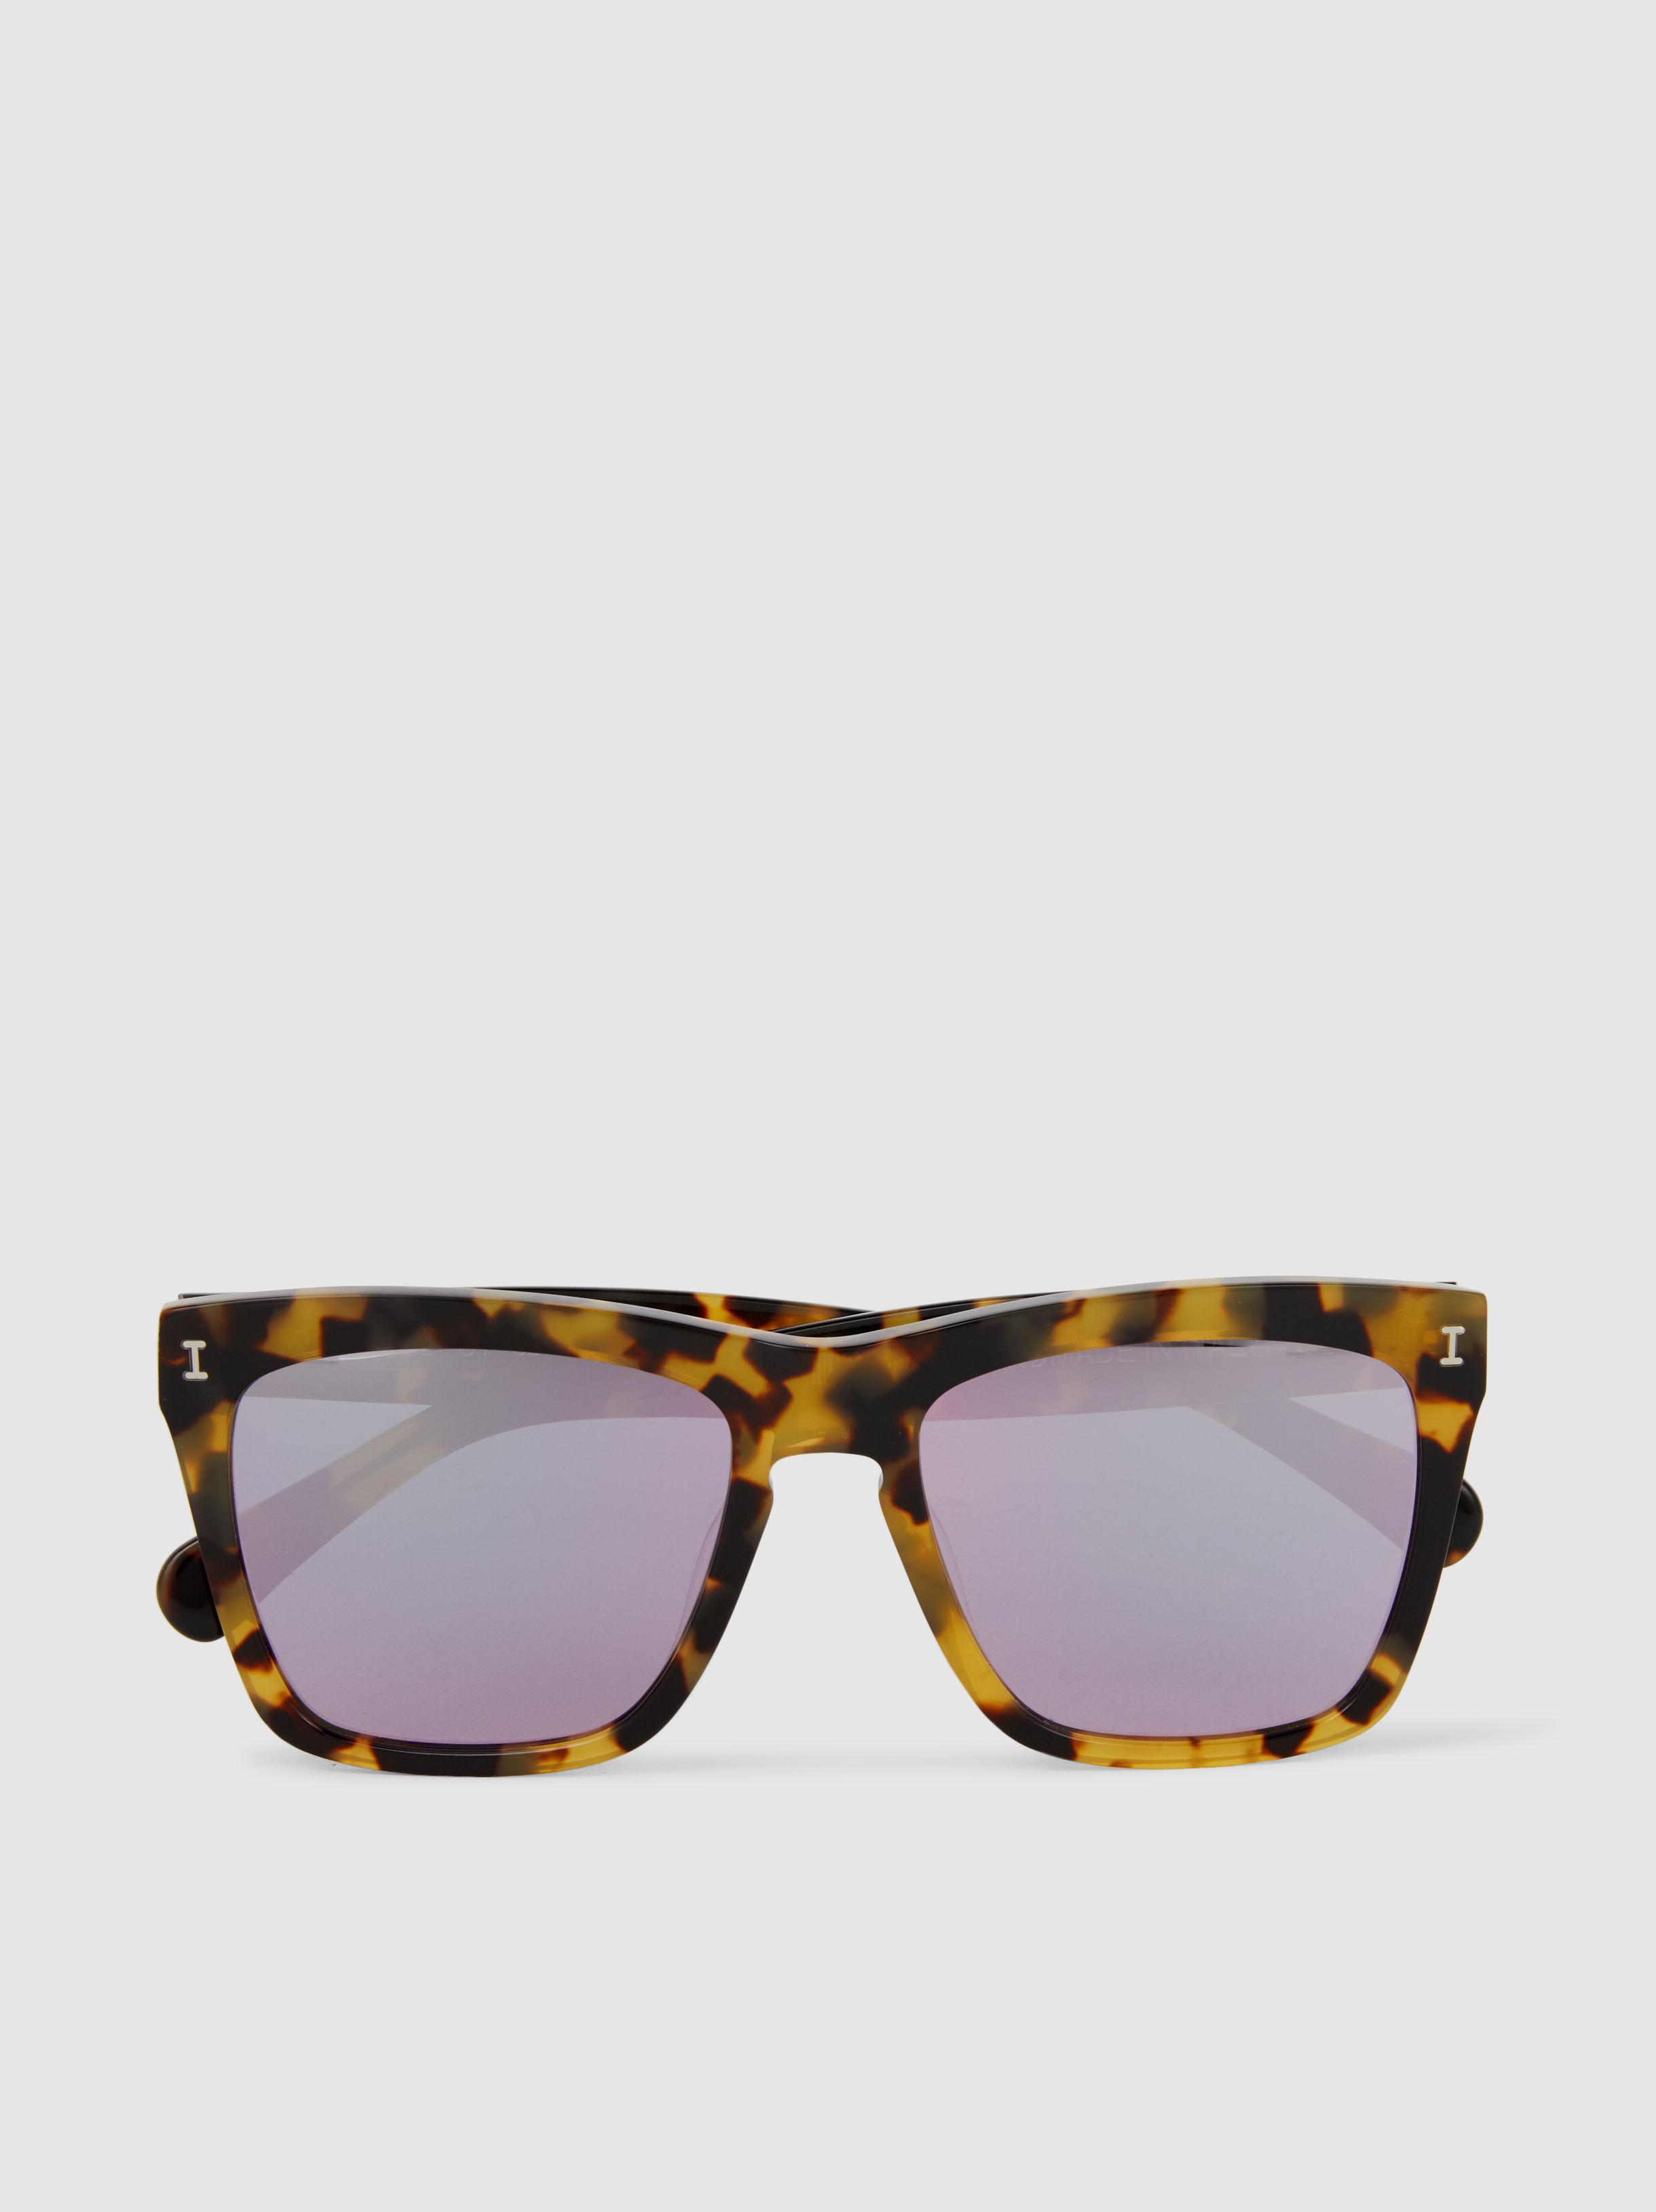 Los Feliz Square Frame Sunglasses Illesteva PgySnXNdR